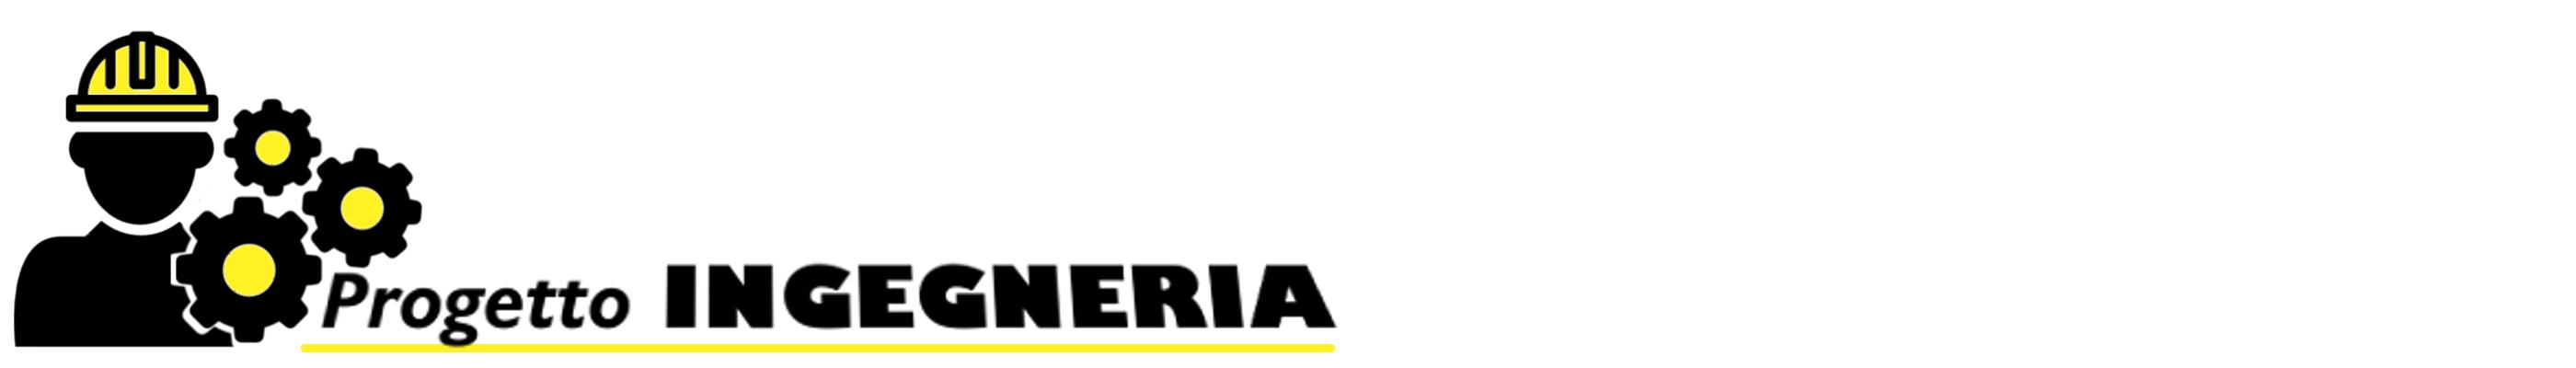 Progetto INGEGNERIA